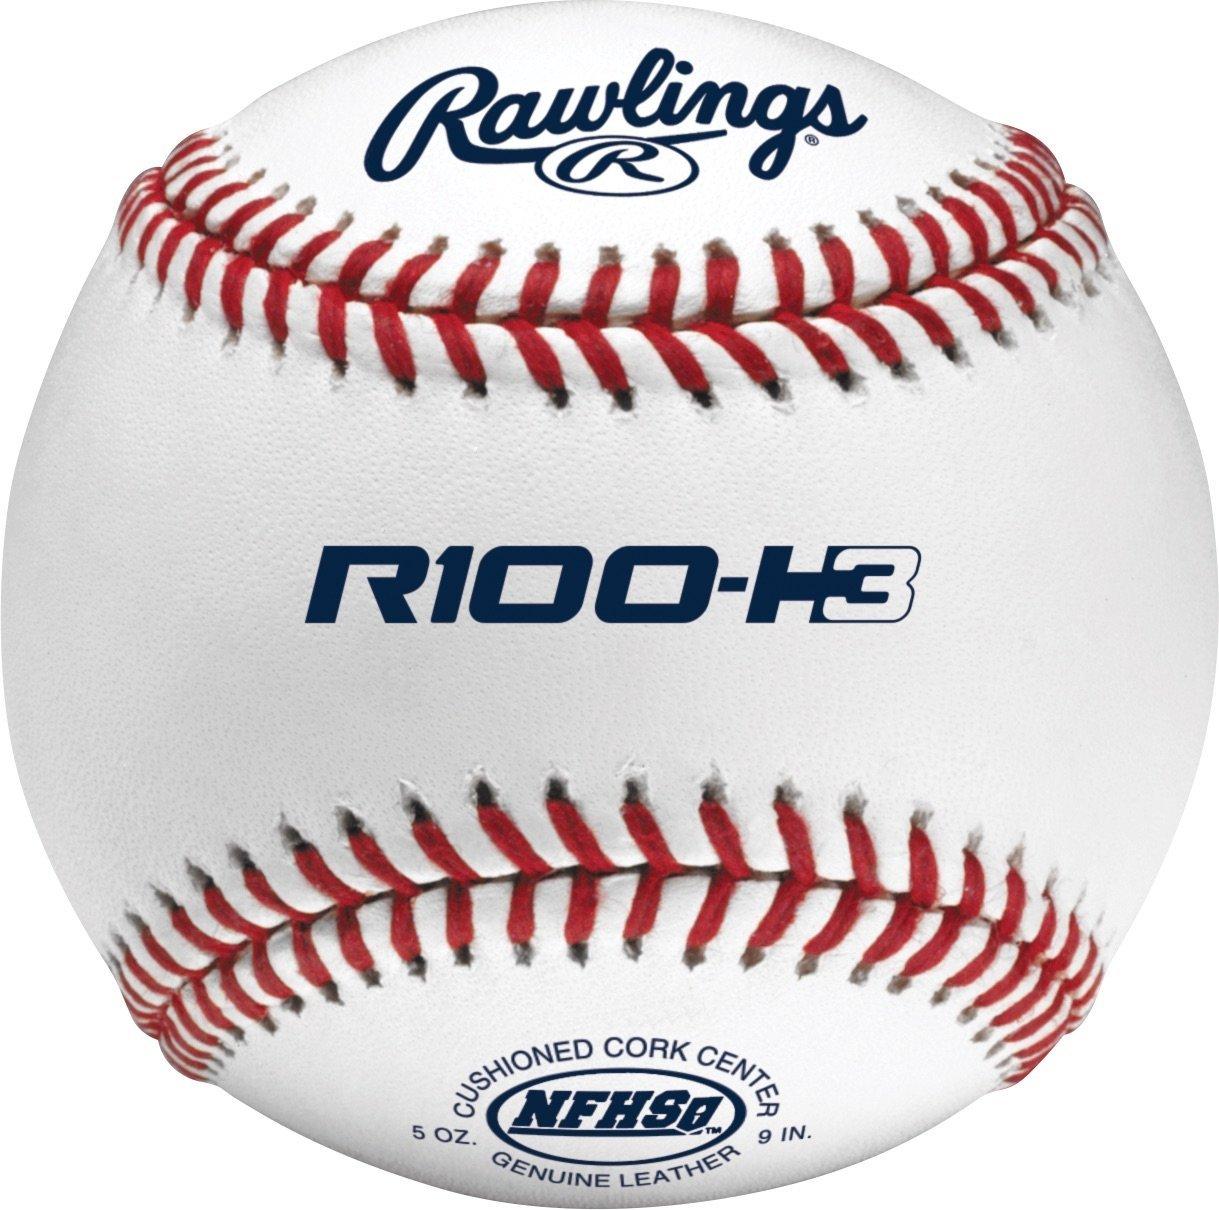 Rawlings Raised Seams Official NFHS High School Baseballs, 12 Count, R100-H3